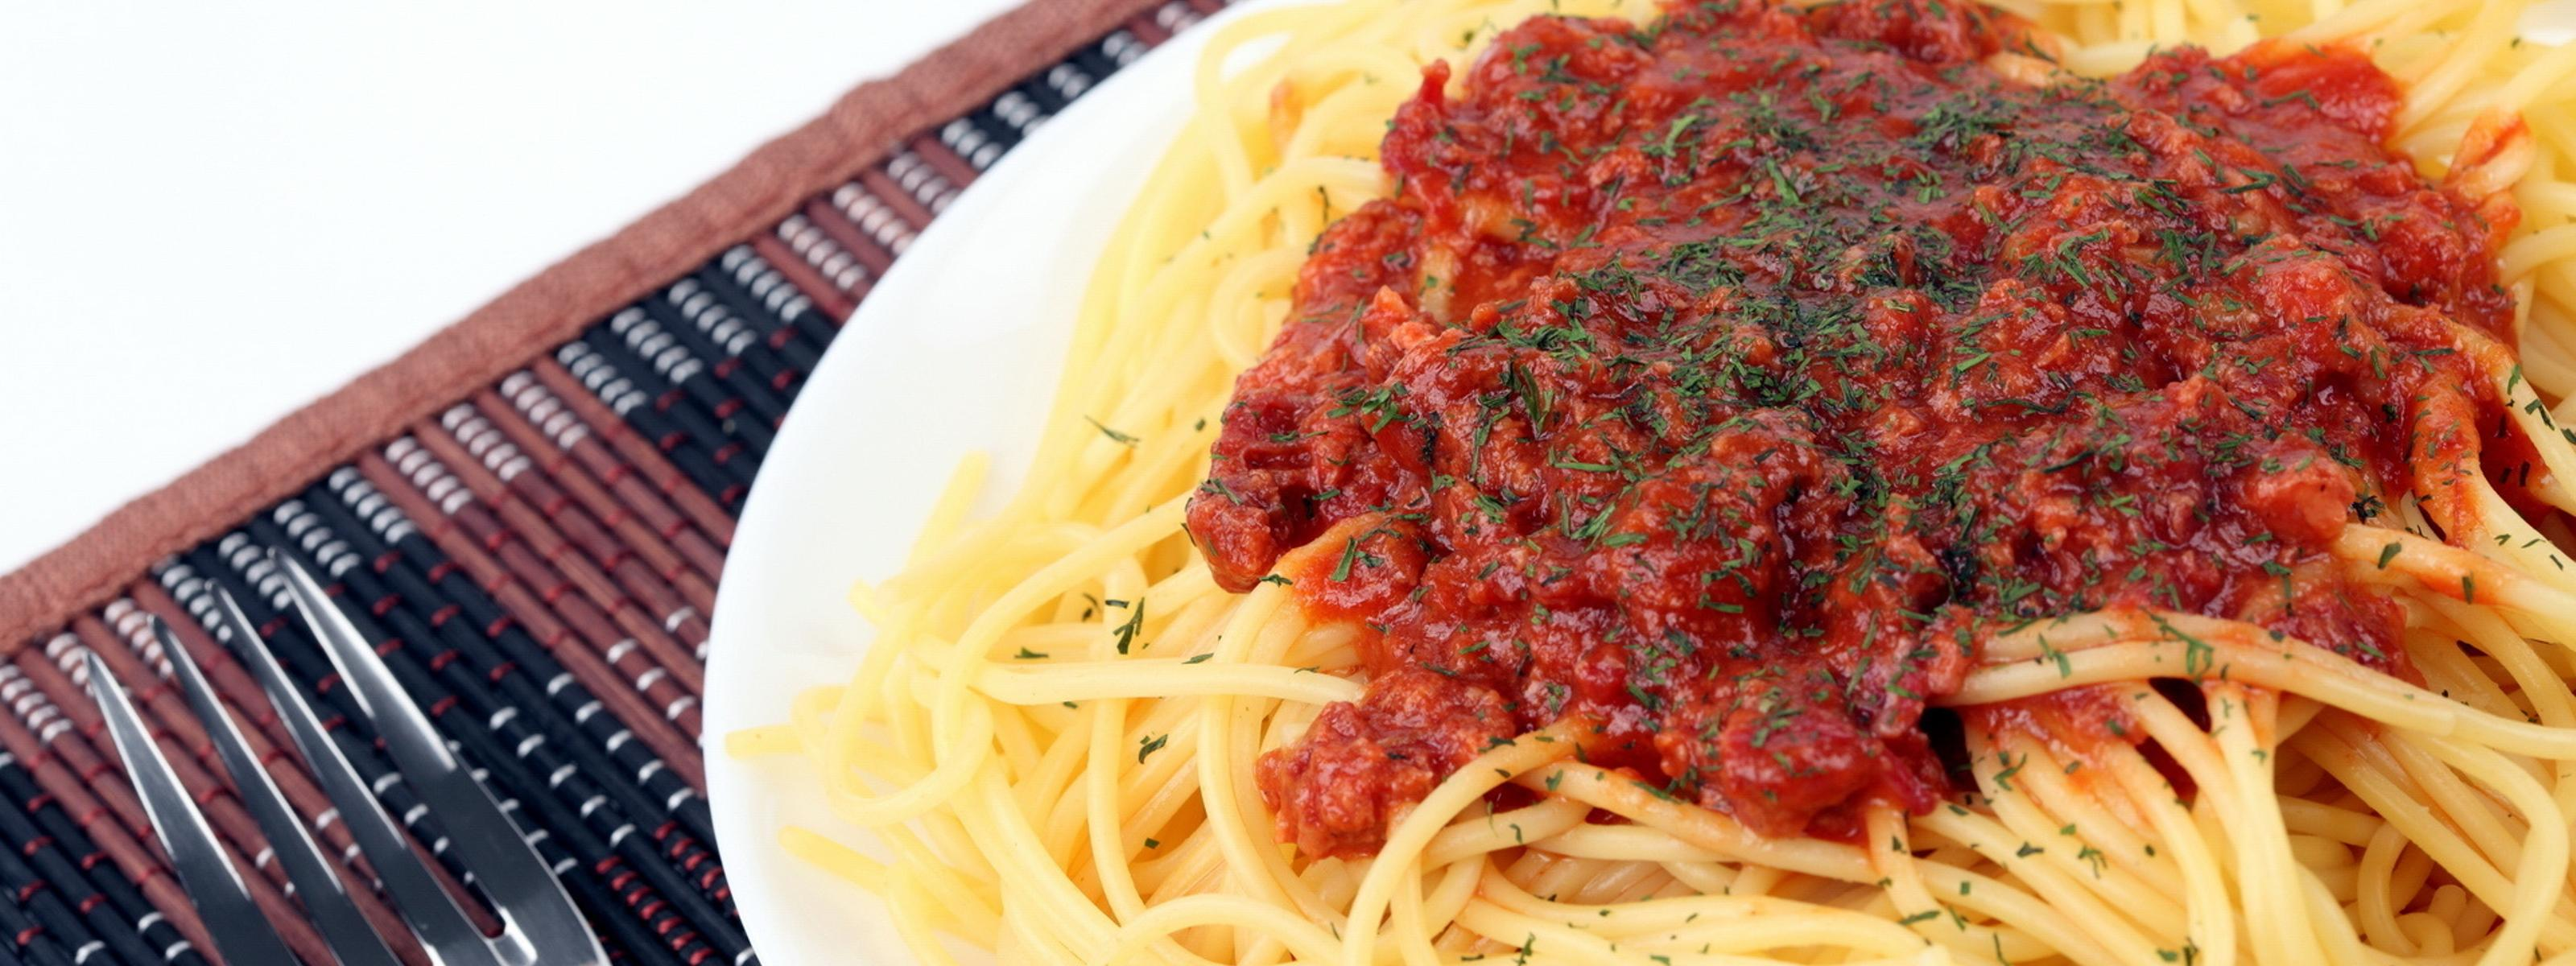 Рецепты соуса к спагетти